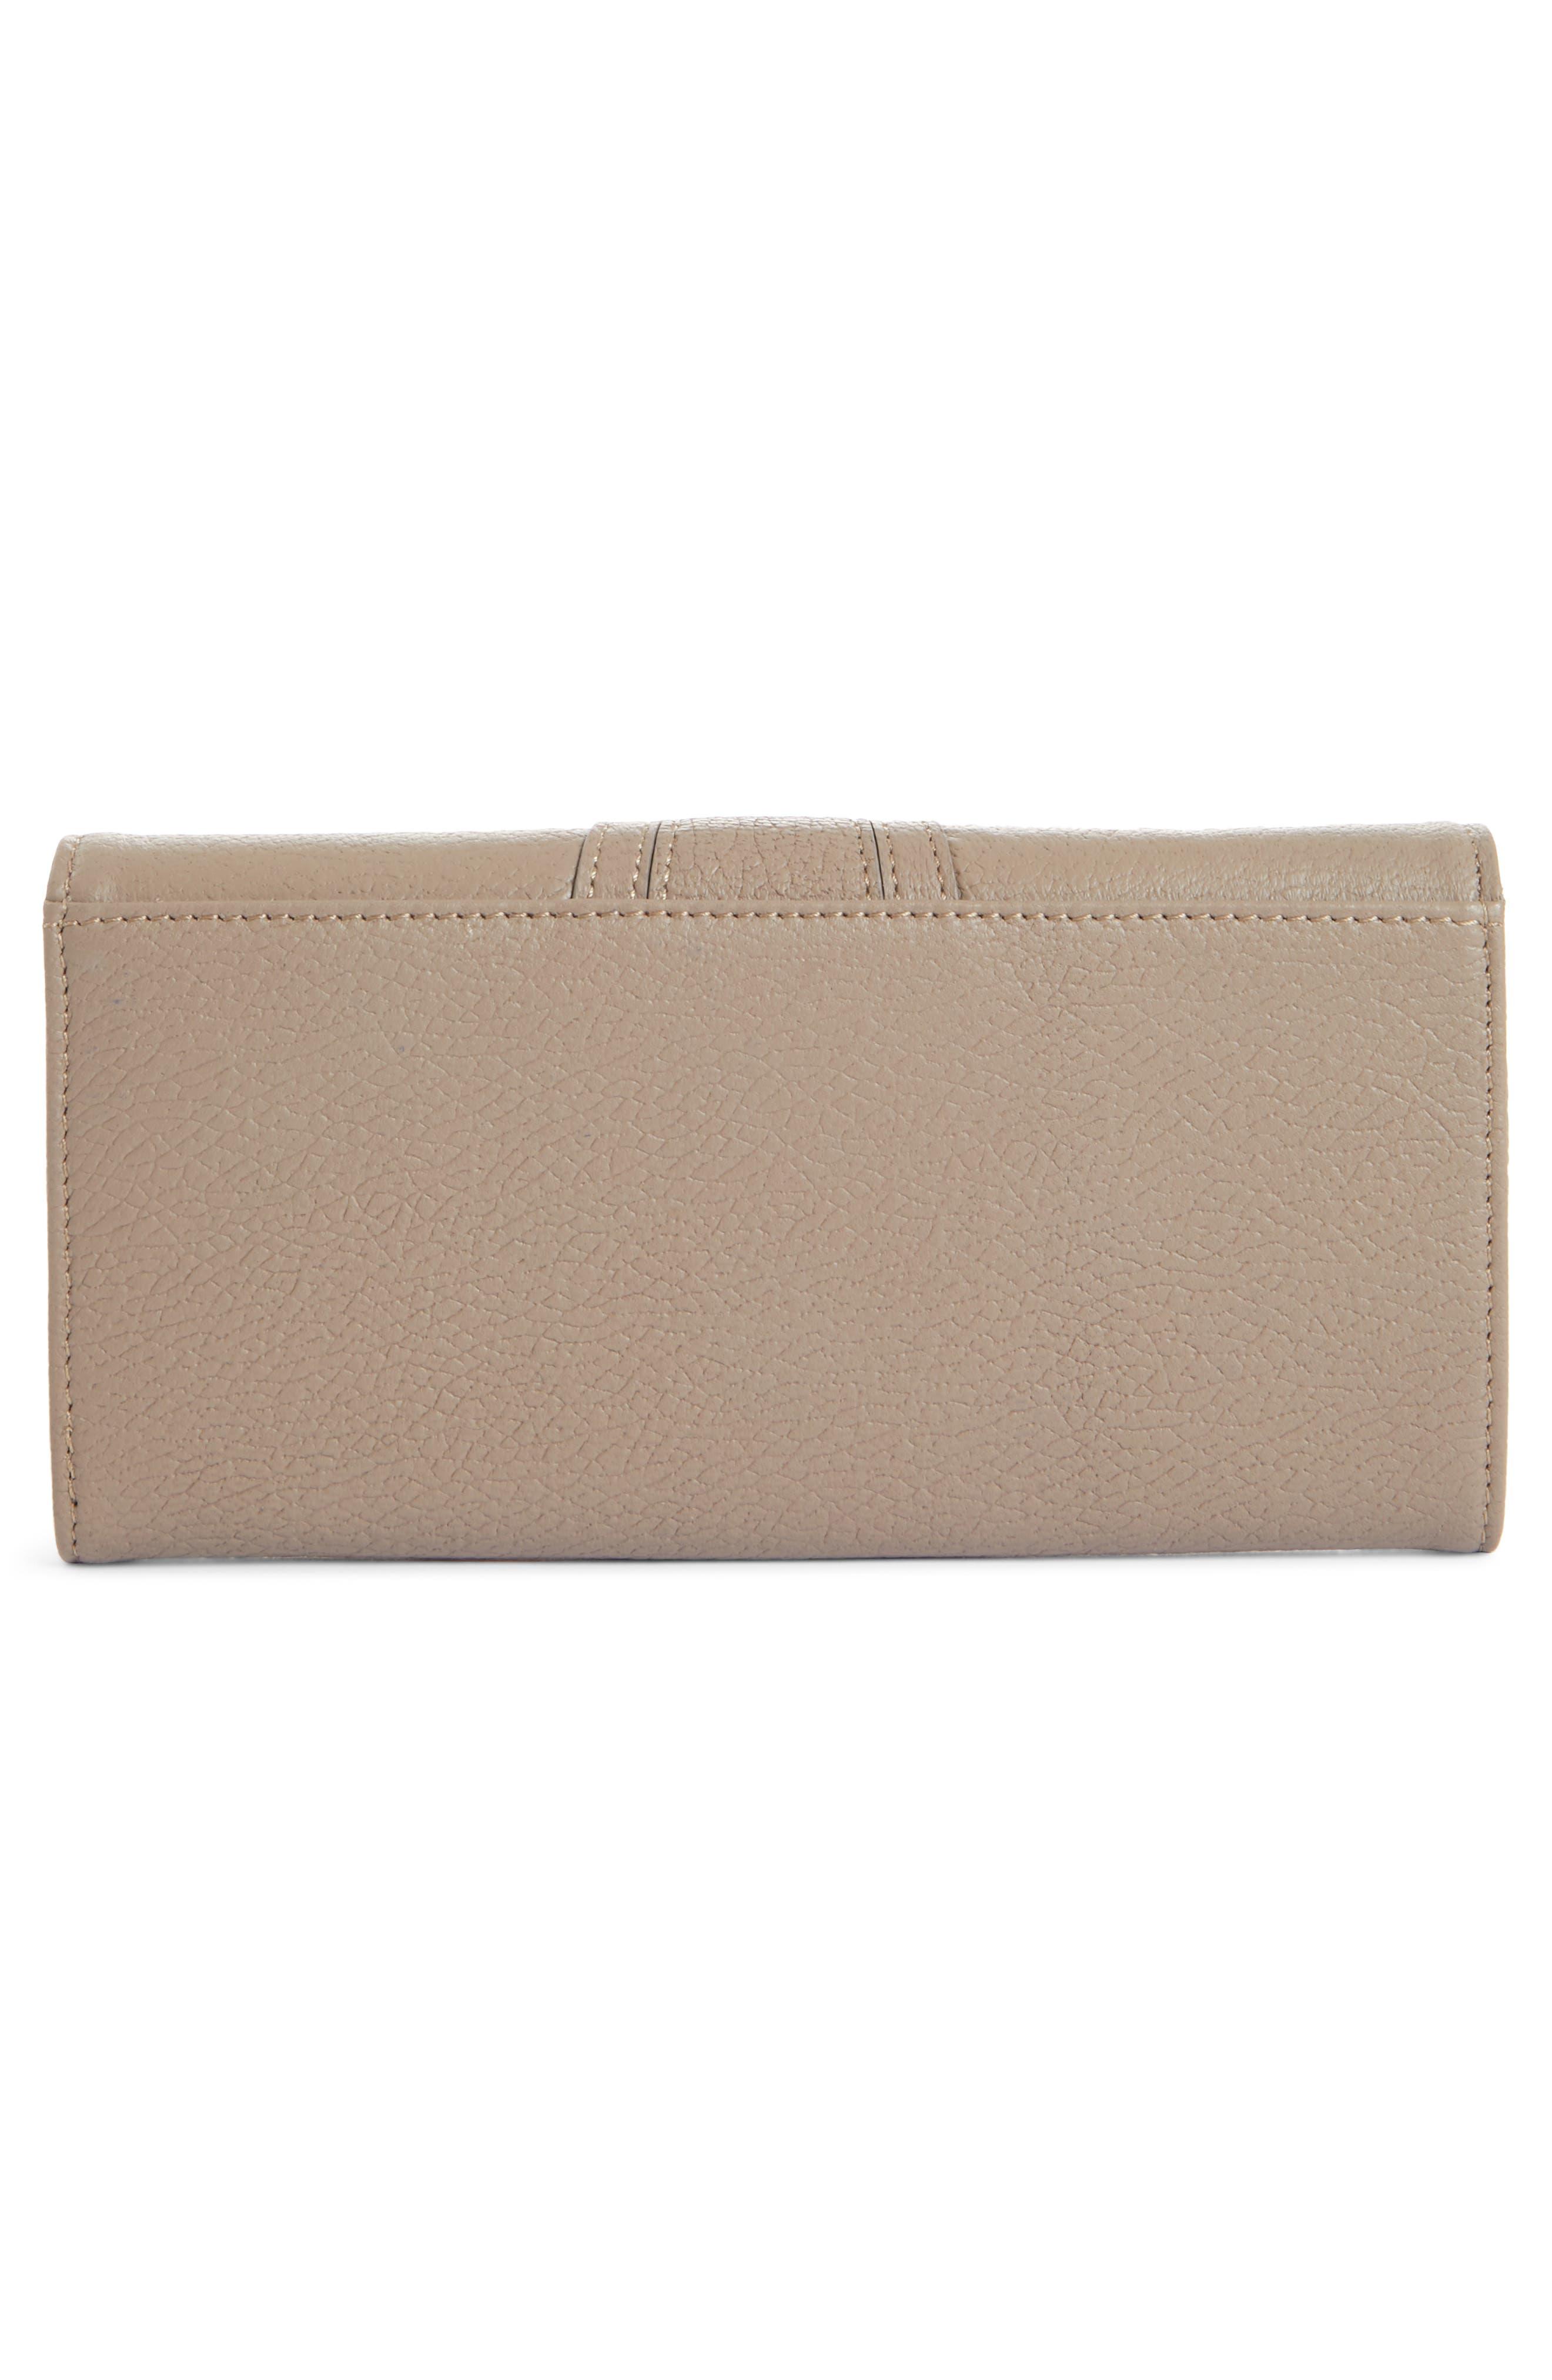 Hana Large Leather Wallet,                             Alternate thumbnail 2, color,                             MOTTY GREY